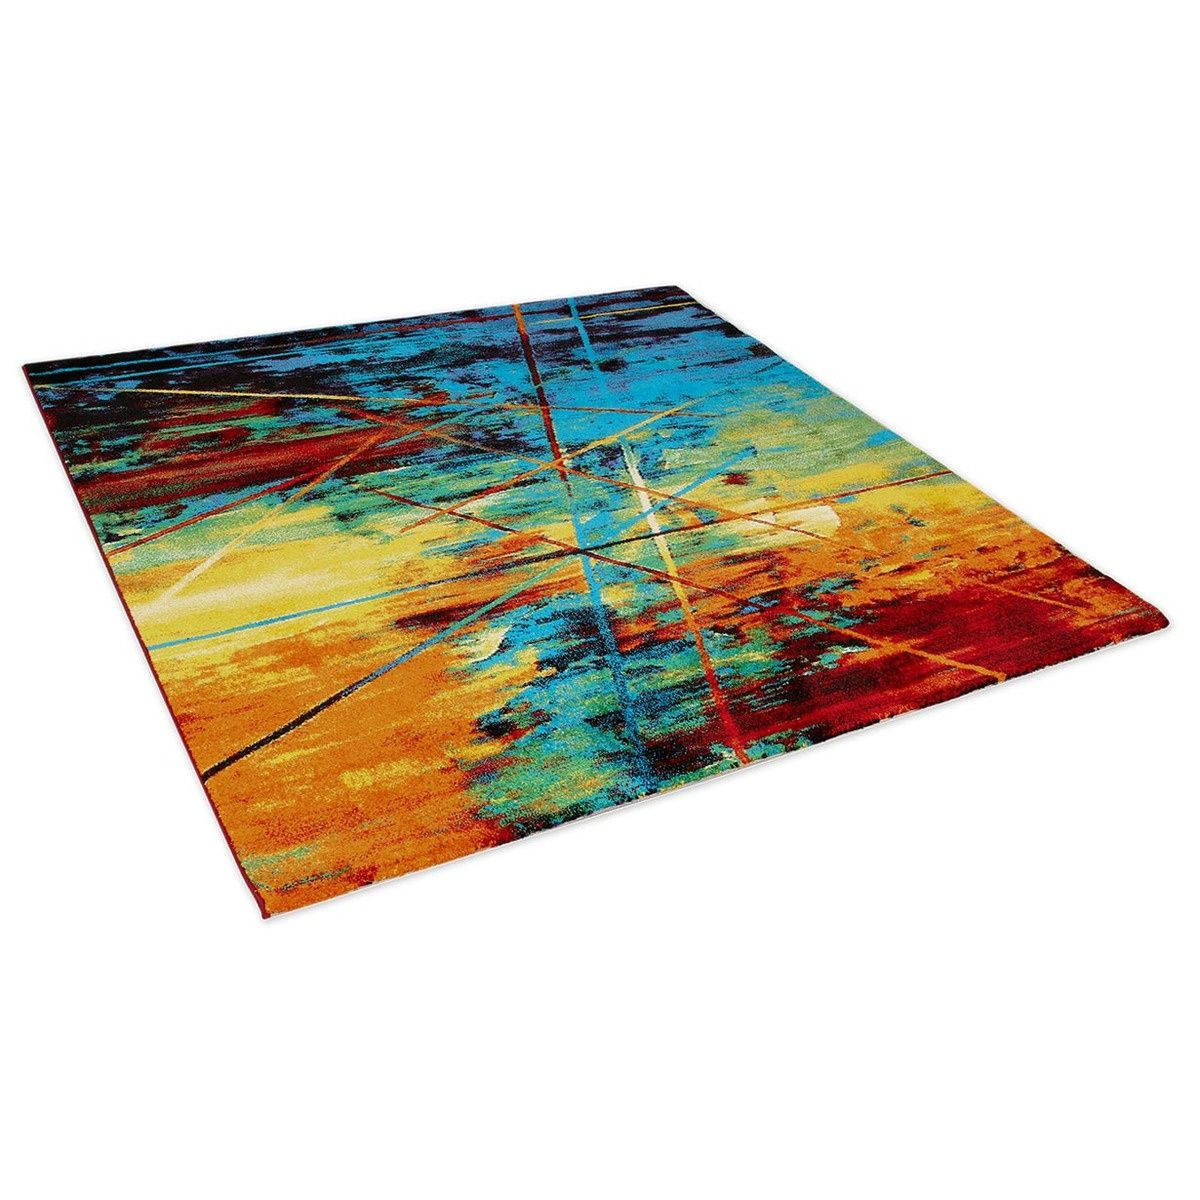 Tappeto Gallery E 200x200cm by Carpet Love LOVEThESIGN